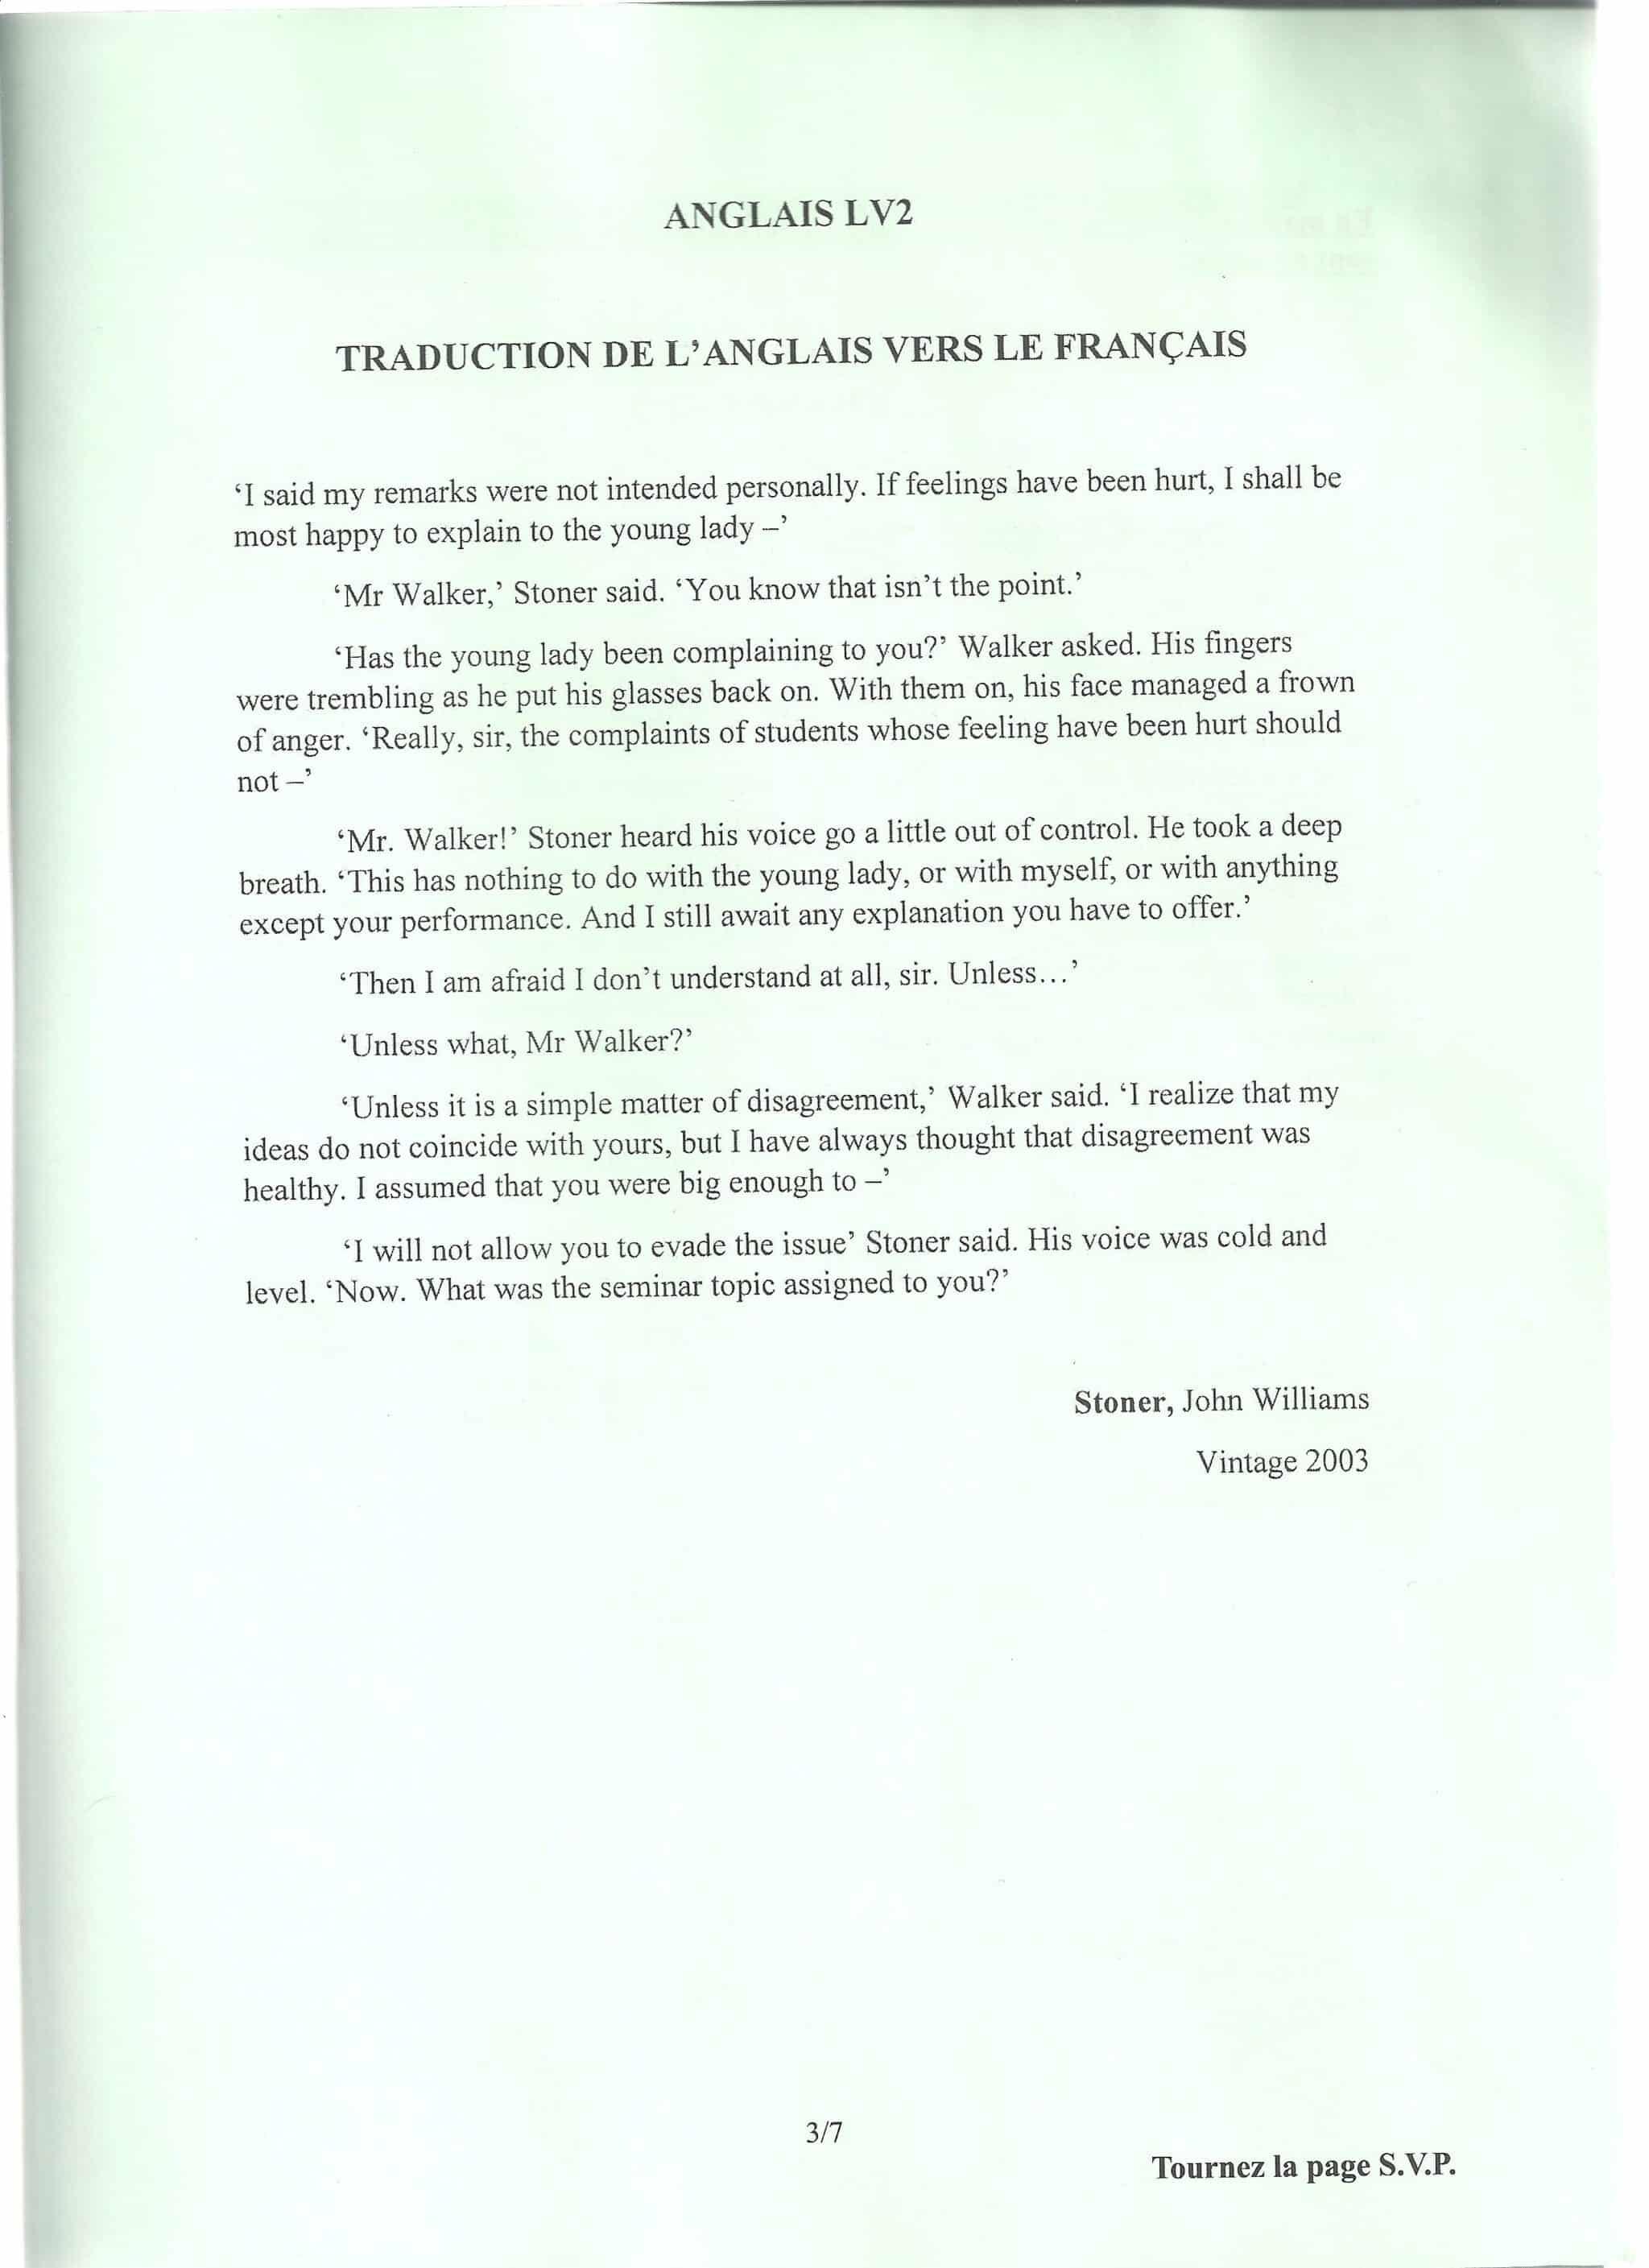 lv2ELVi Traductions 003